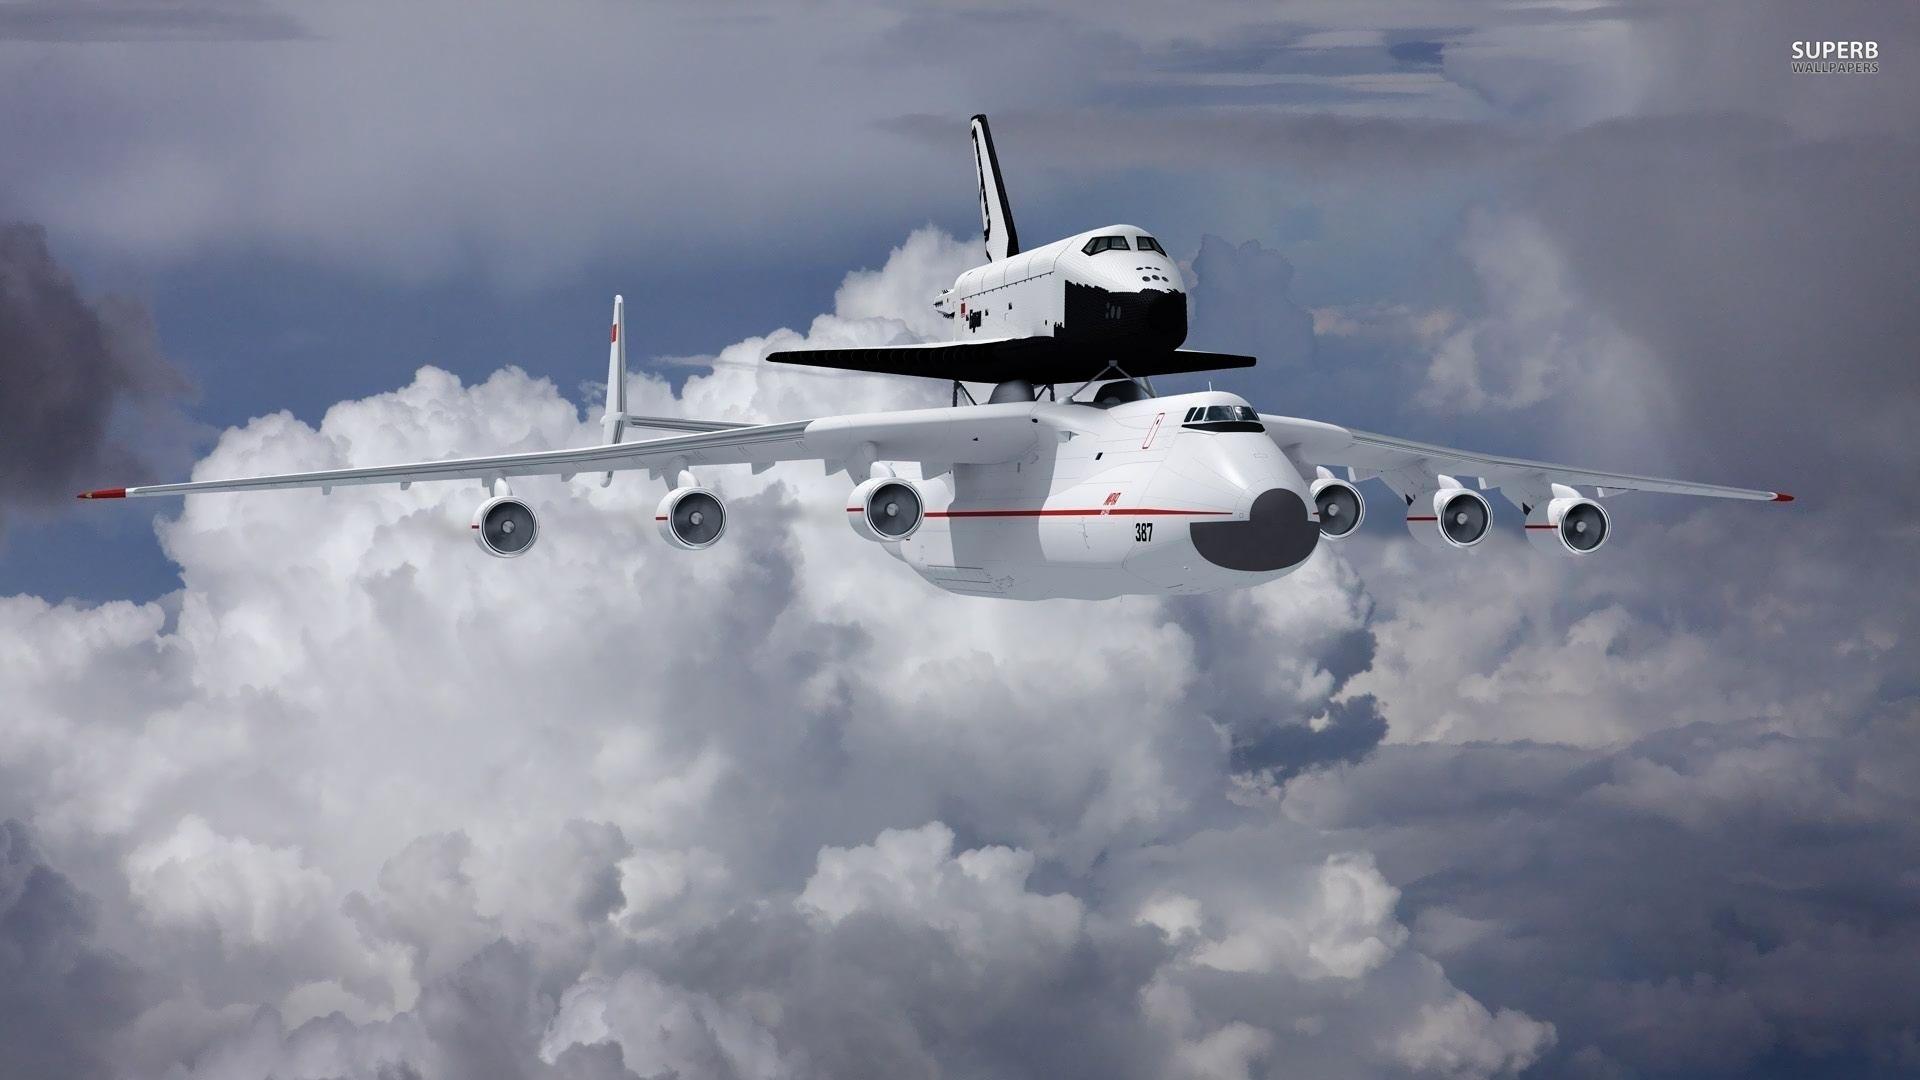 Antonov 225 Crash Related Keywords & Suggestions - Antonov 225 Crash